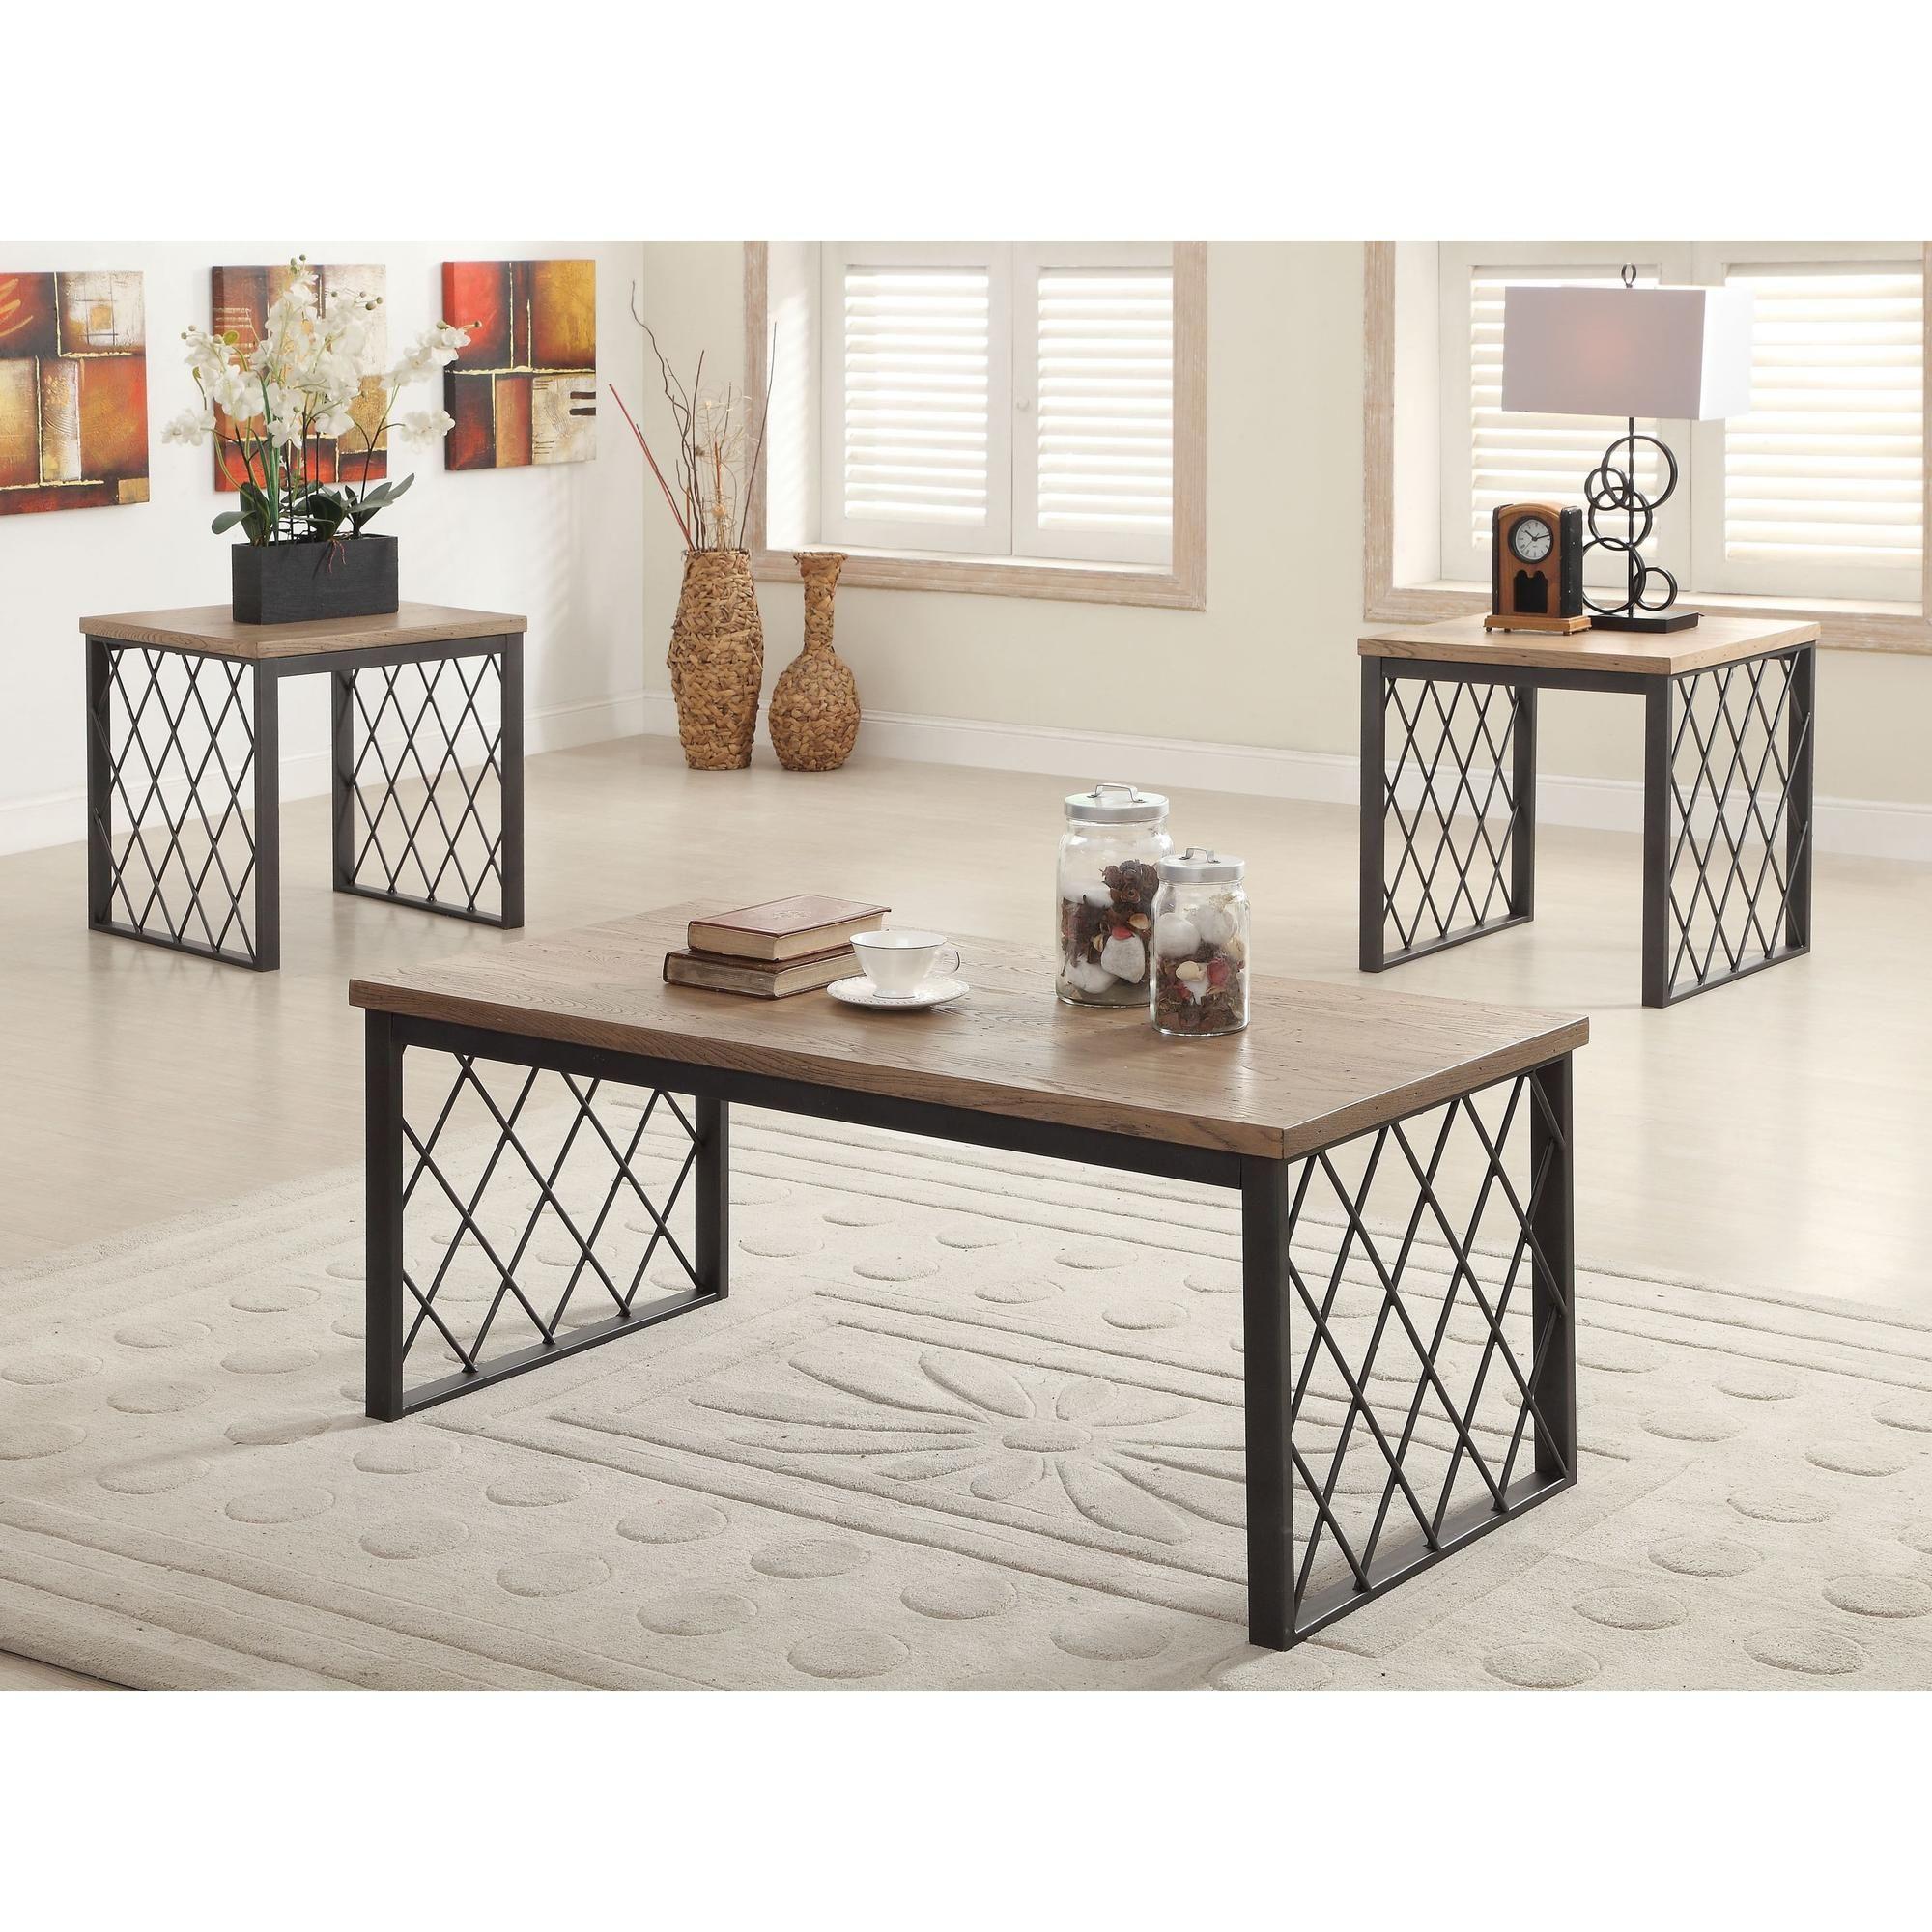 Best Pin By মিঠুন রায় On Furniture 3 Piece Coffee Table Set 400 x 300